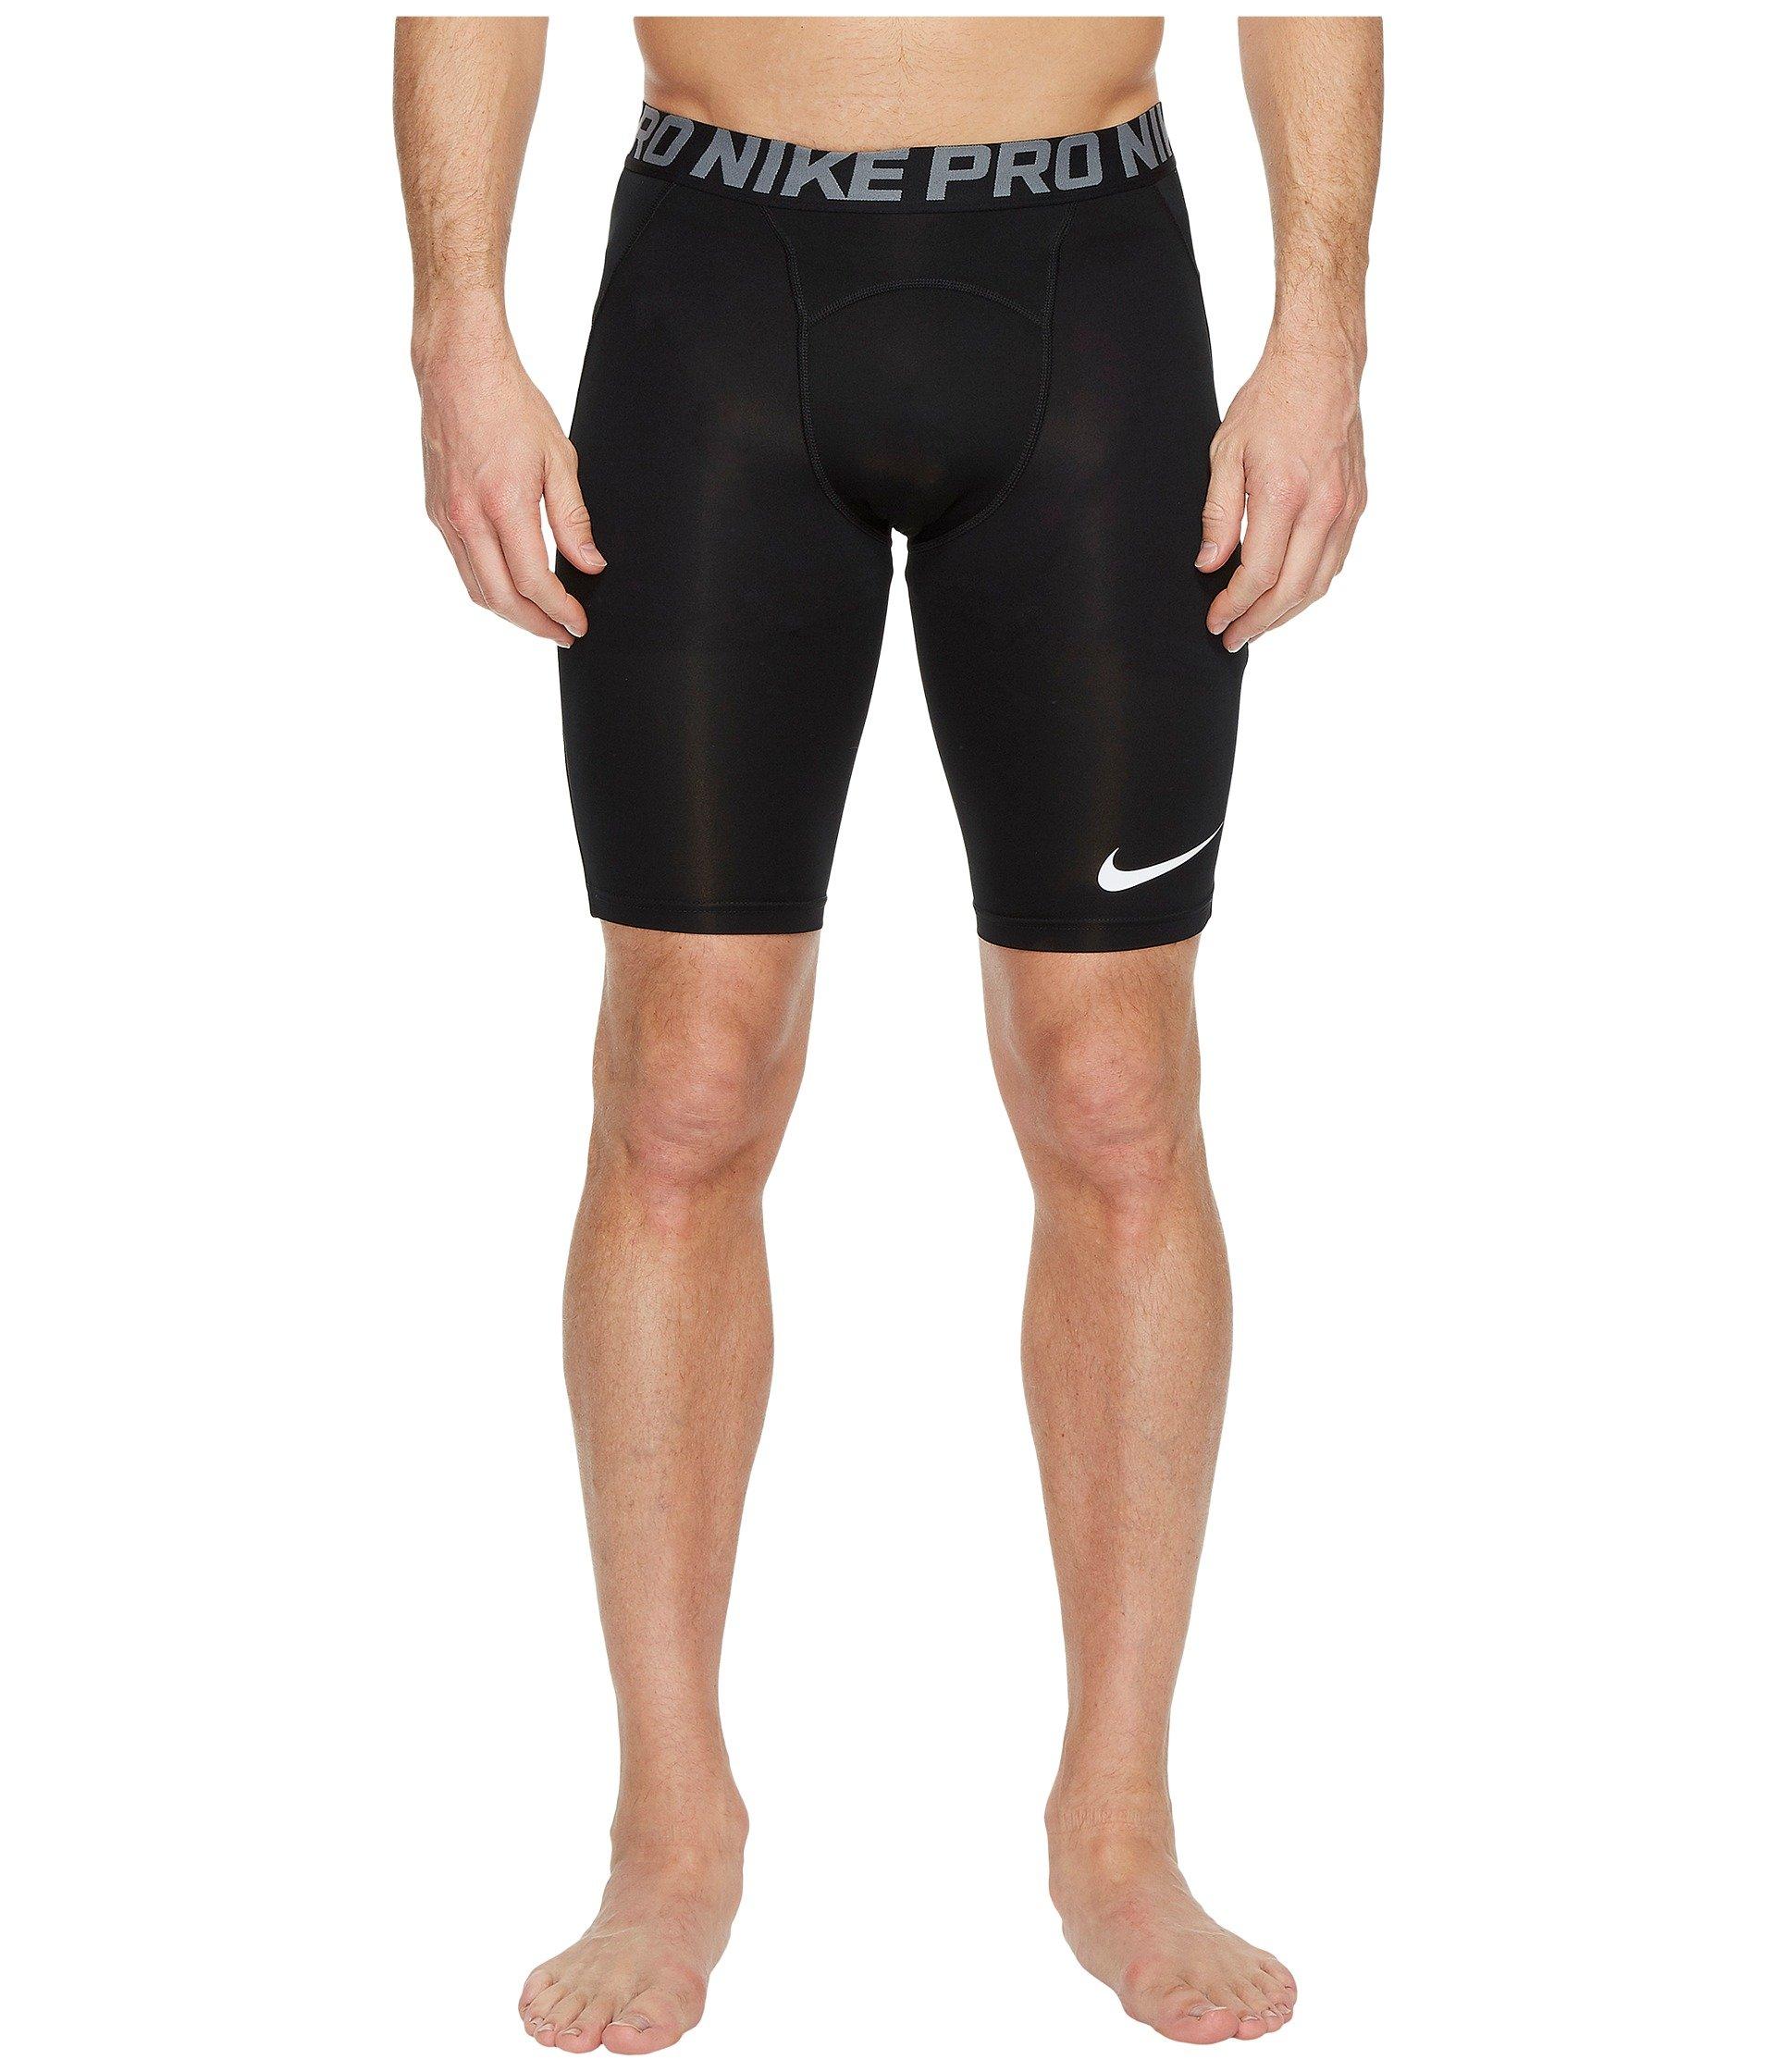 Nike Men's Pro Heist Slider Baseball Shorts (Black/Cool Grey/White, Medium 11.5) by Nike